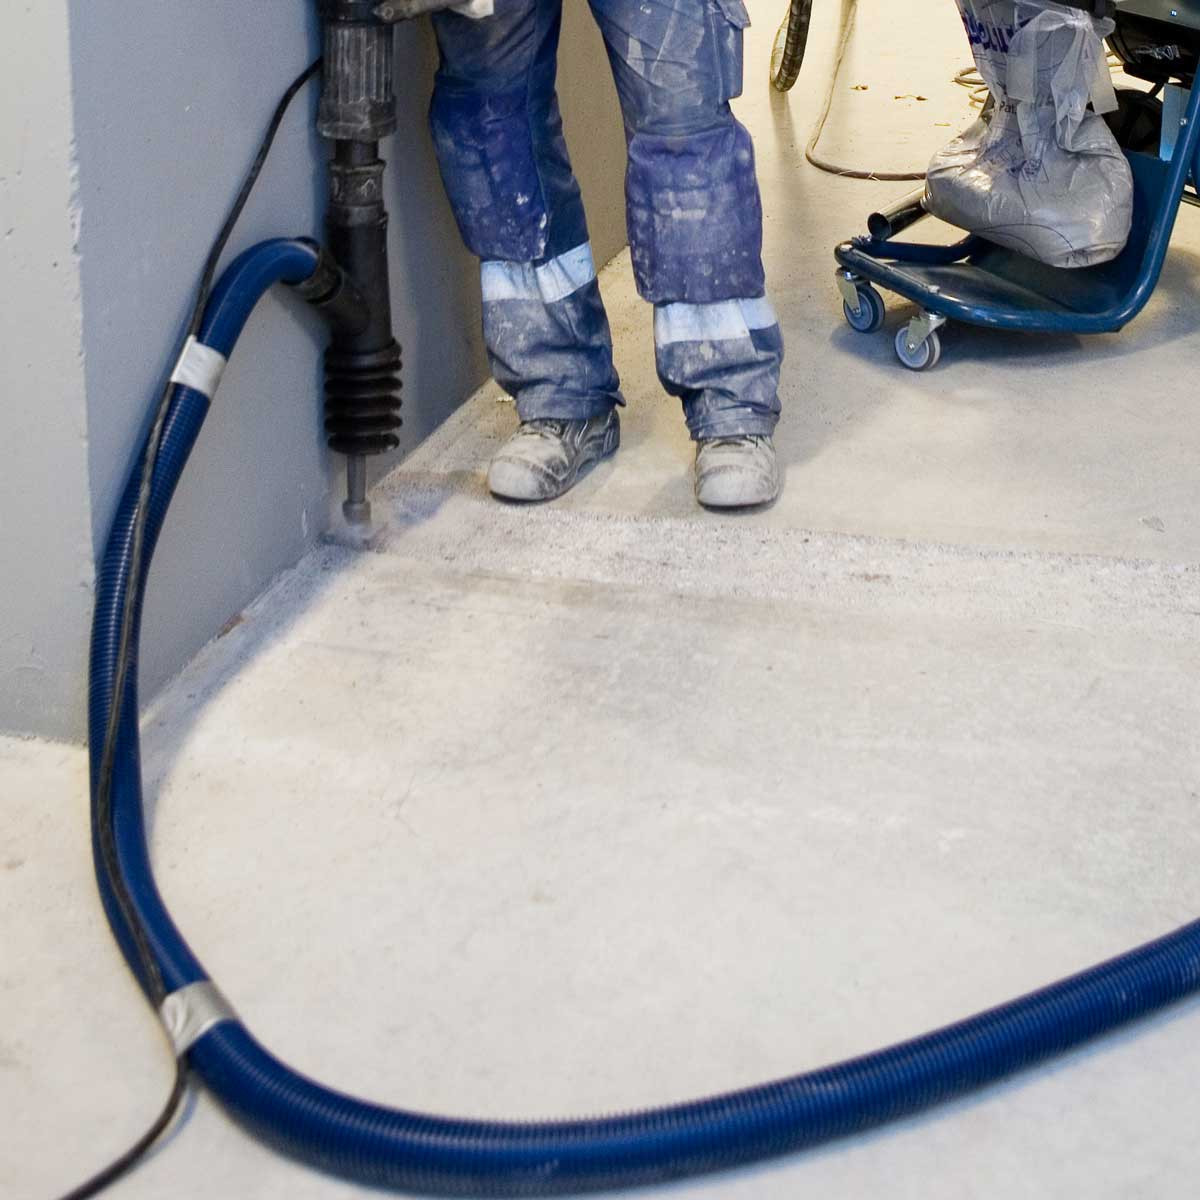 DustControl DC 2900c core drill vac